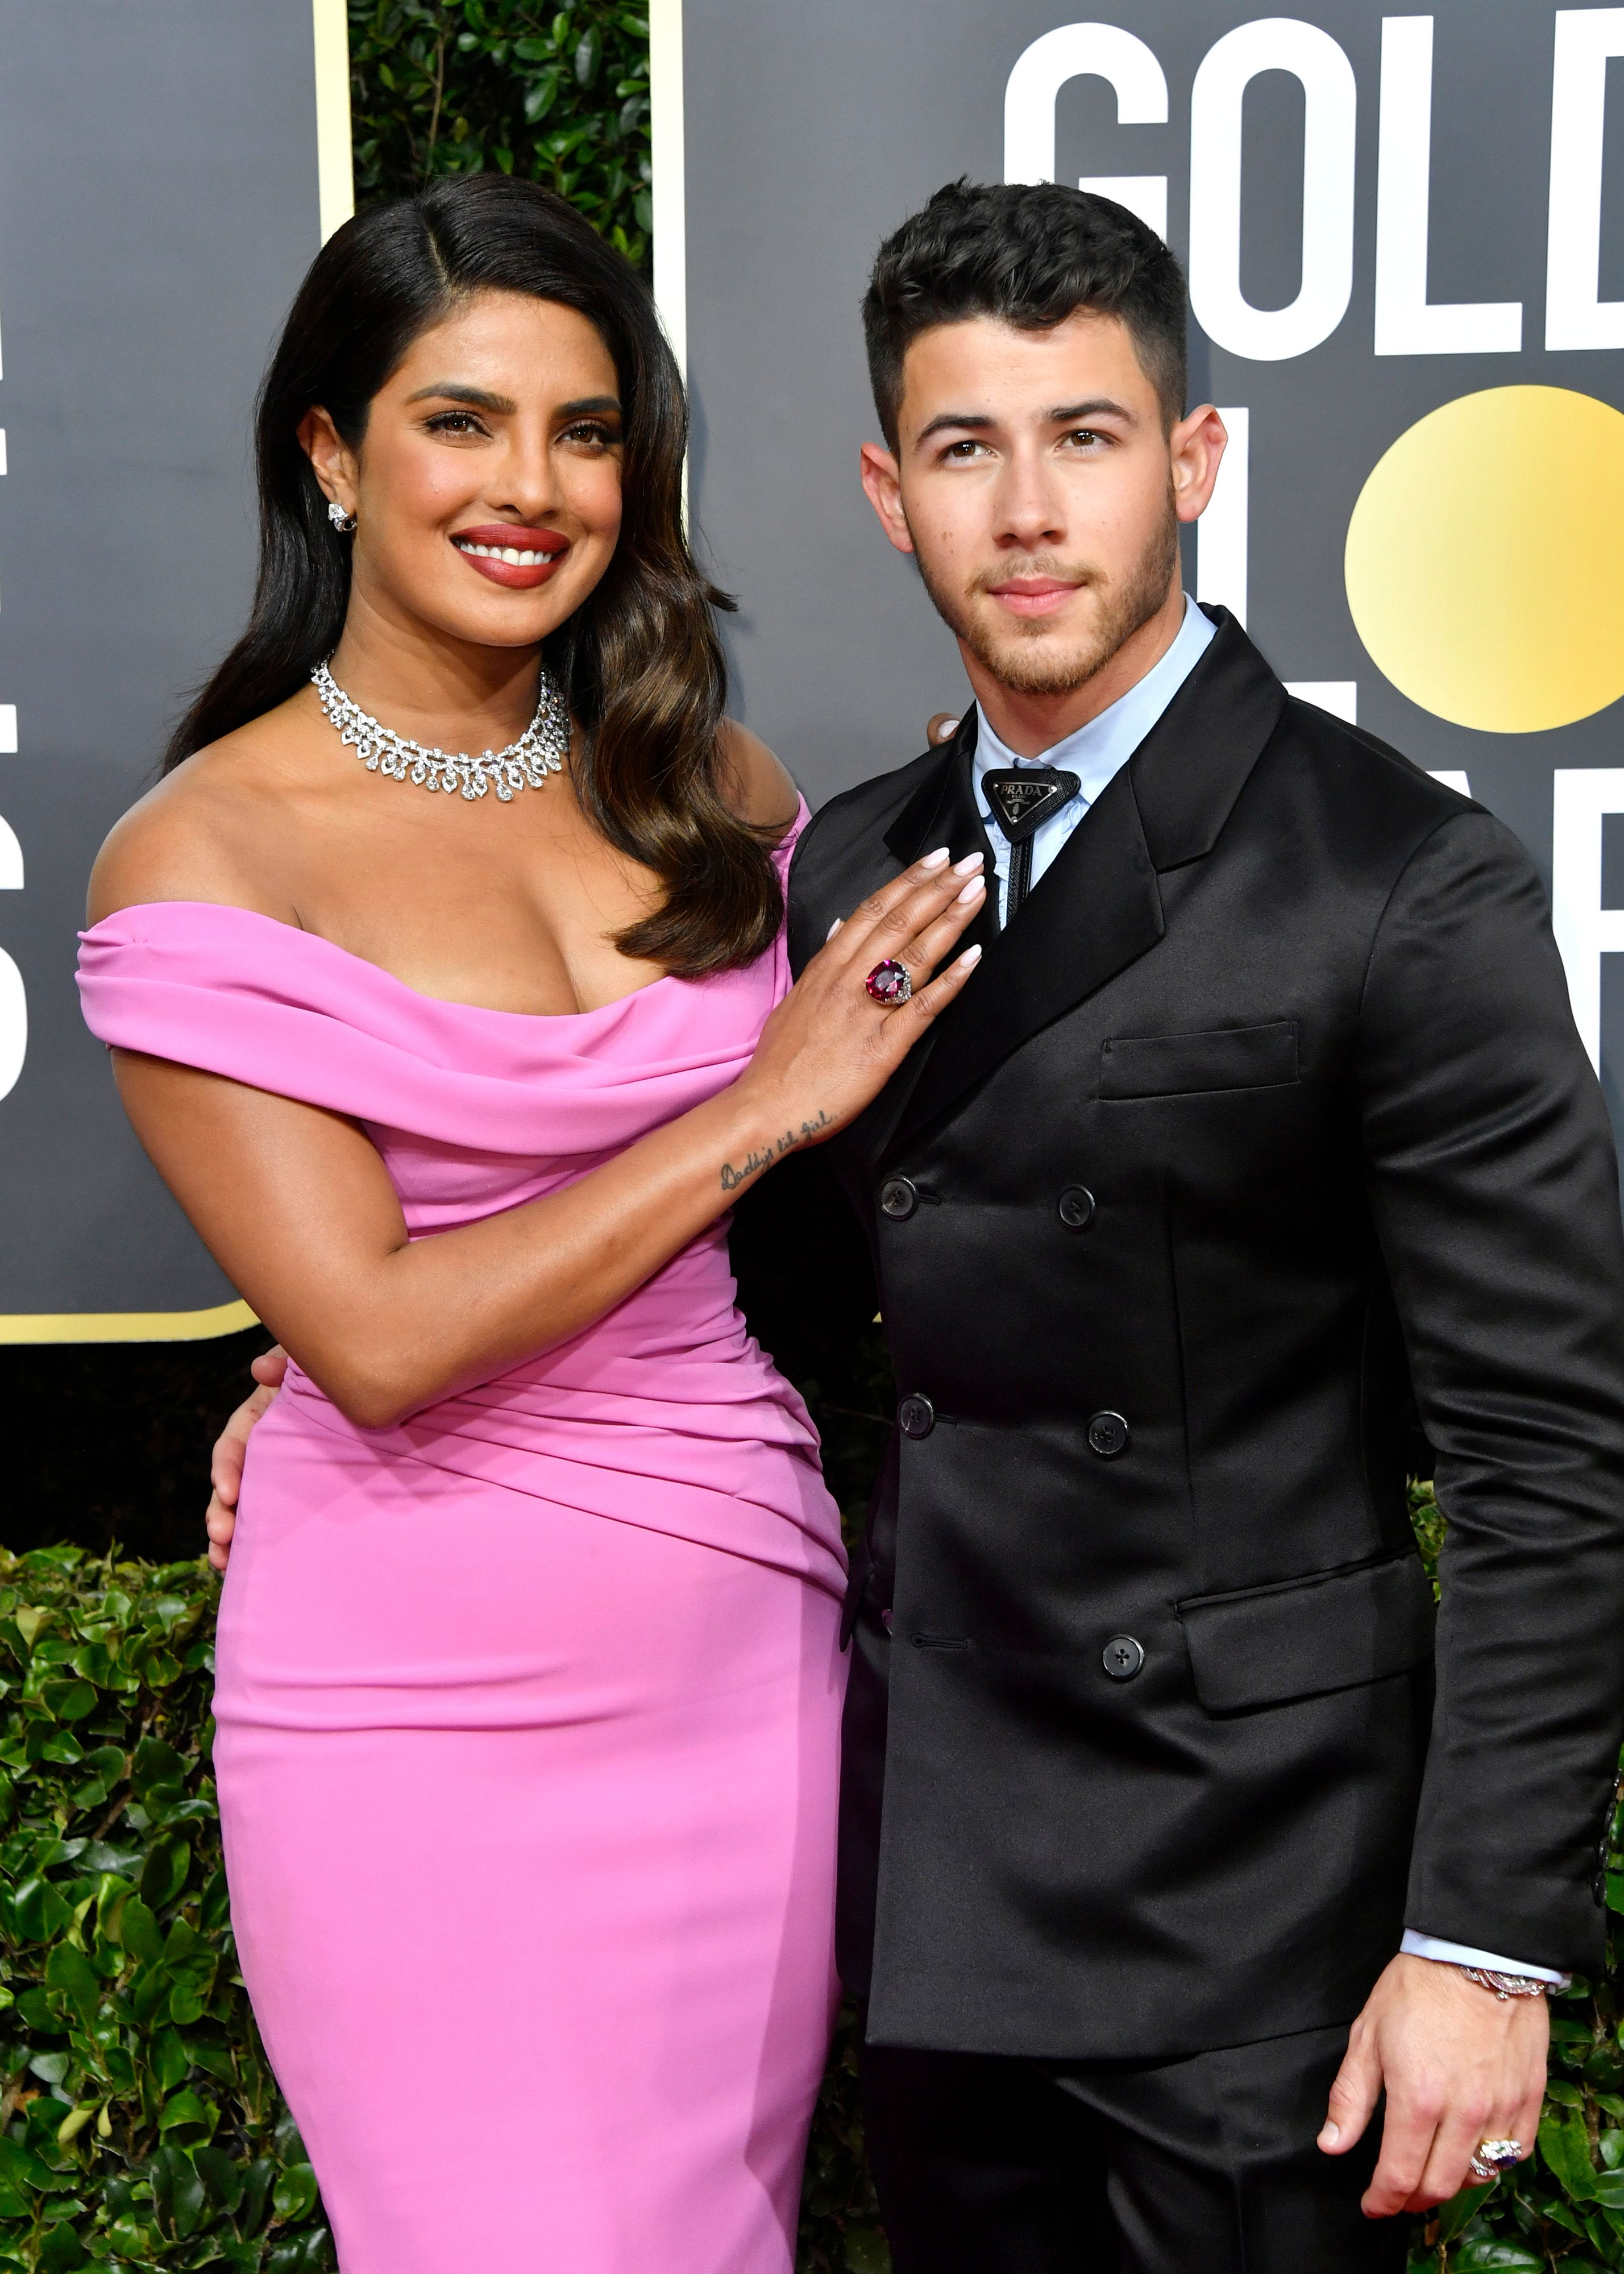 Nick Jonas Gushes About Wife Priyanka Chopra After Obvious